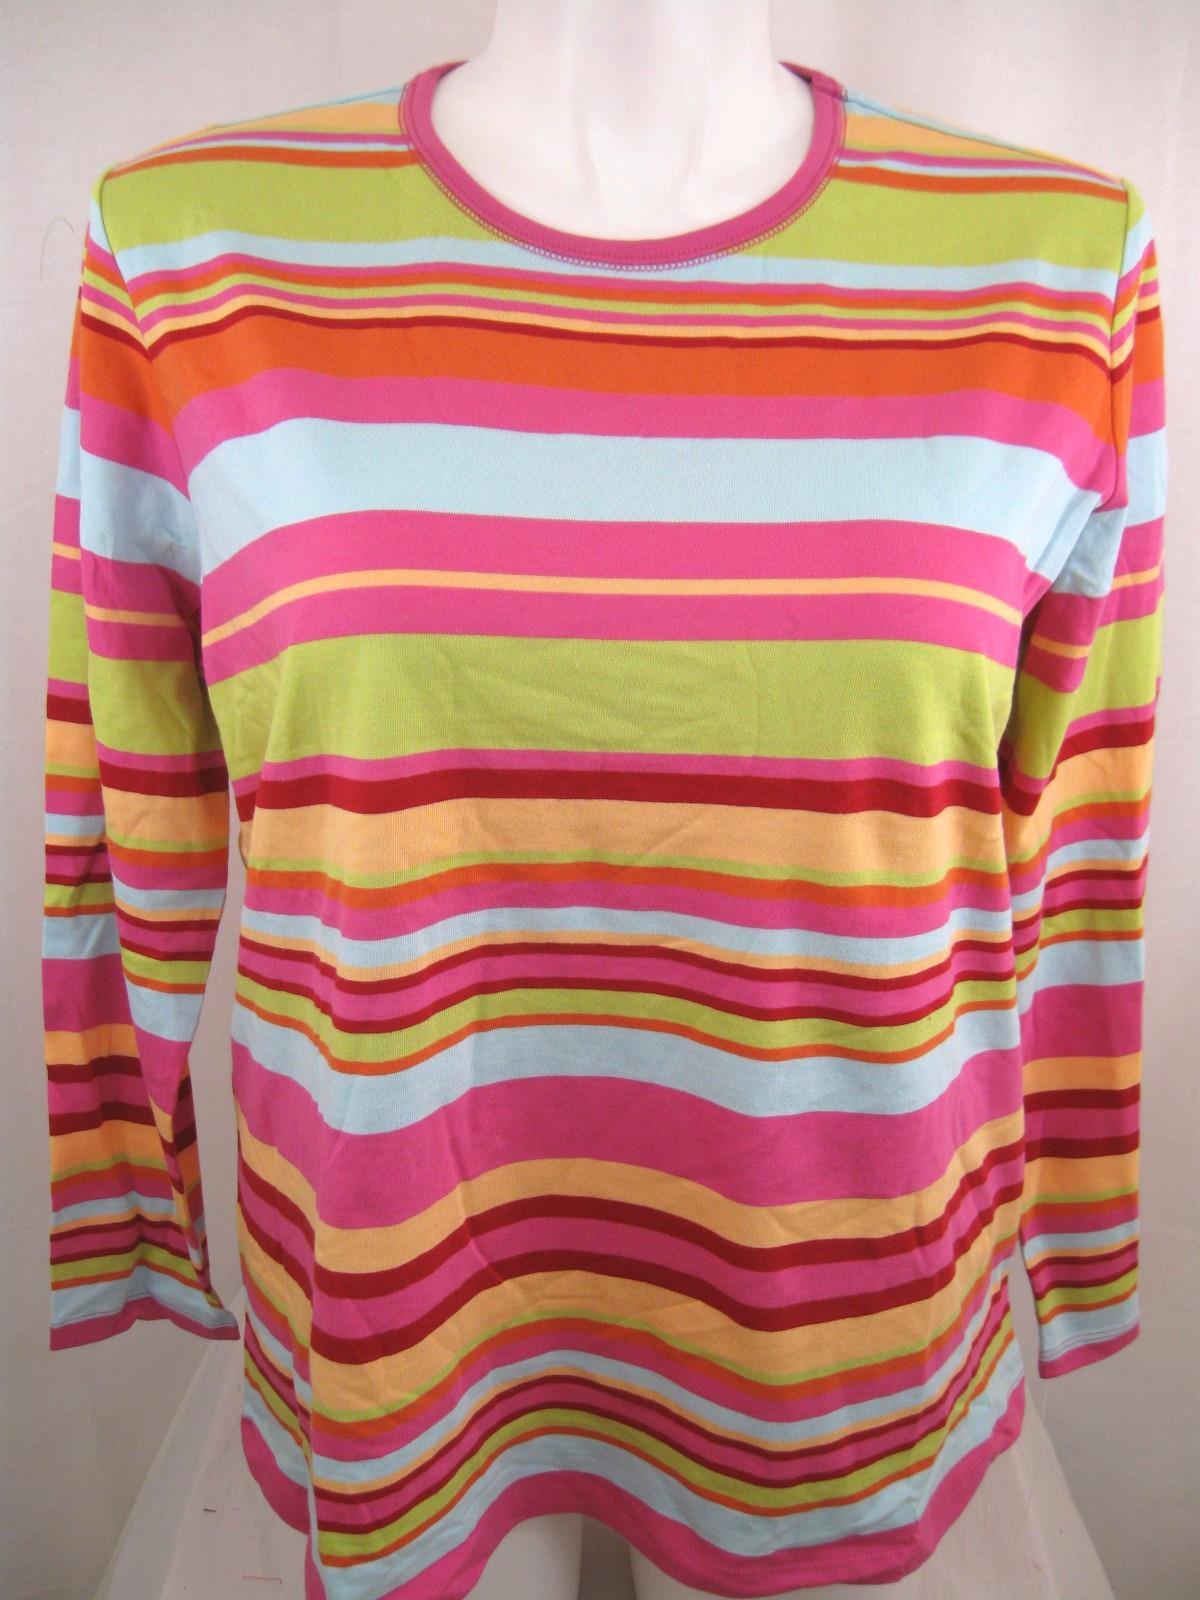 Covington-Woman-Plus-Size-Striped-Long-Sleeve-Knit-Top-w-Crew-Neck